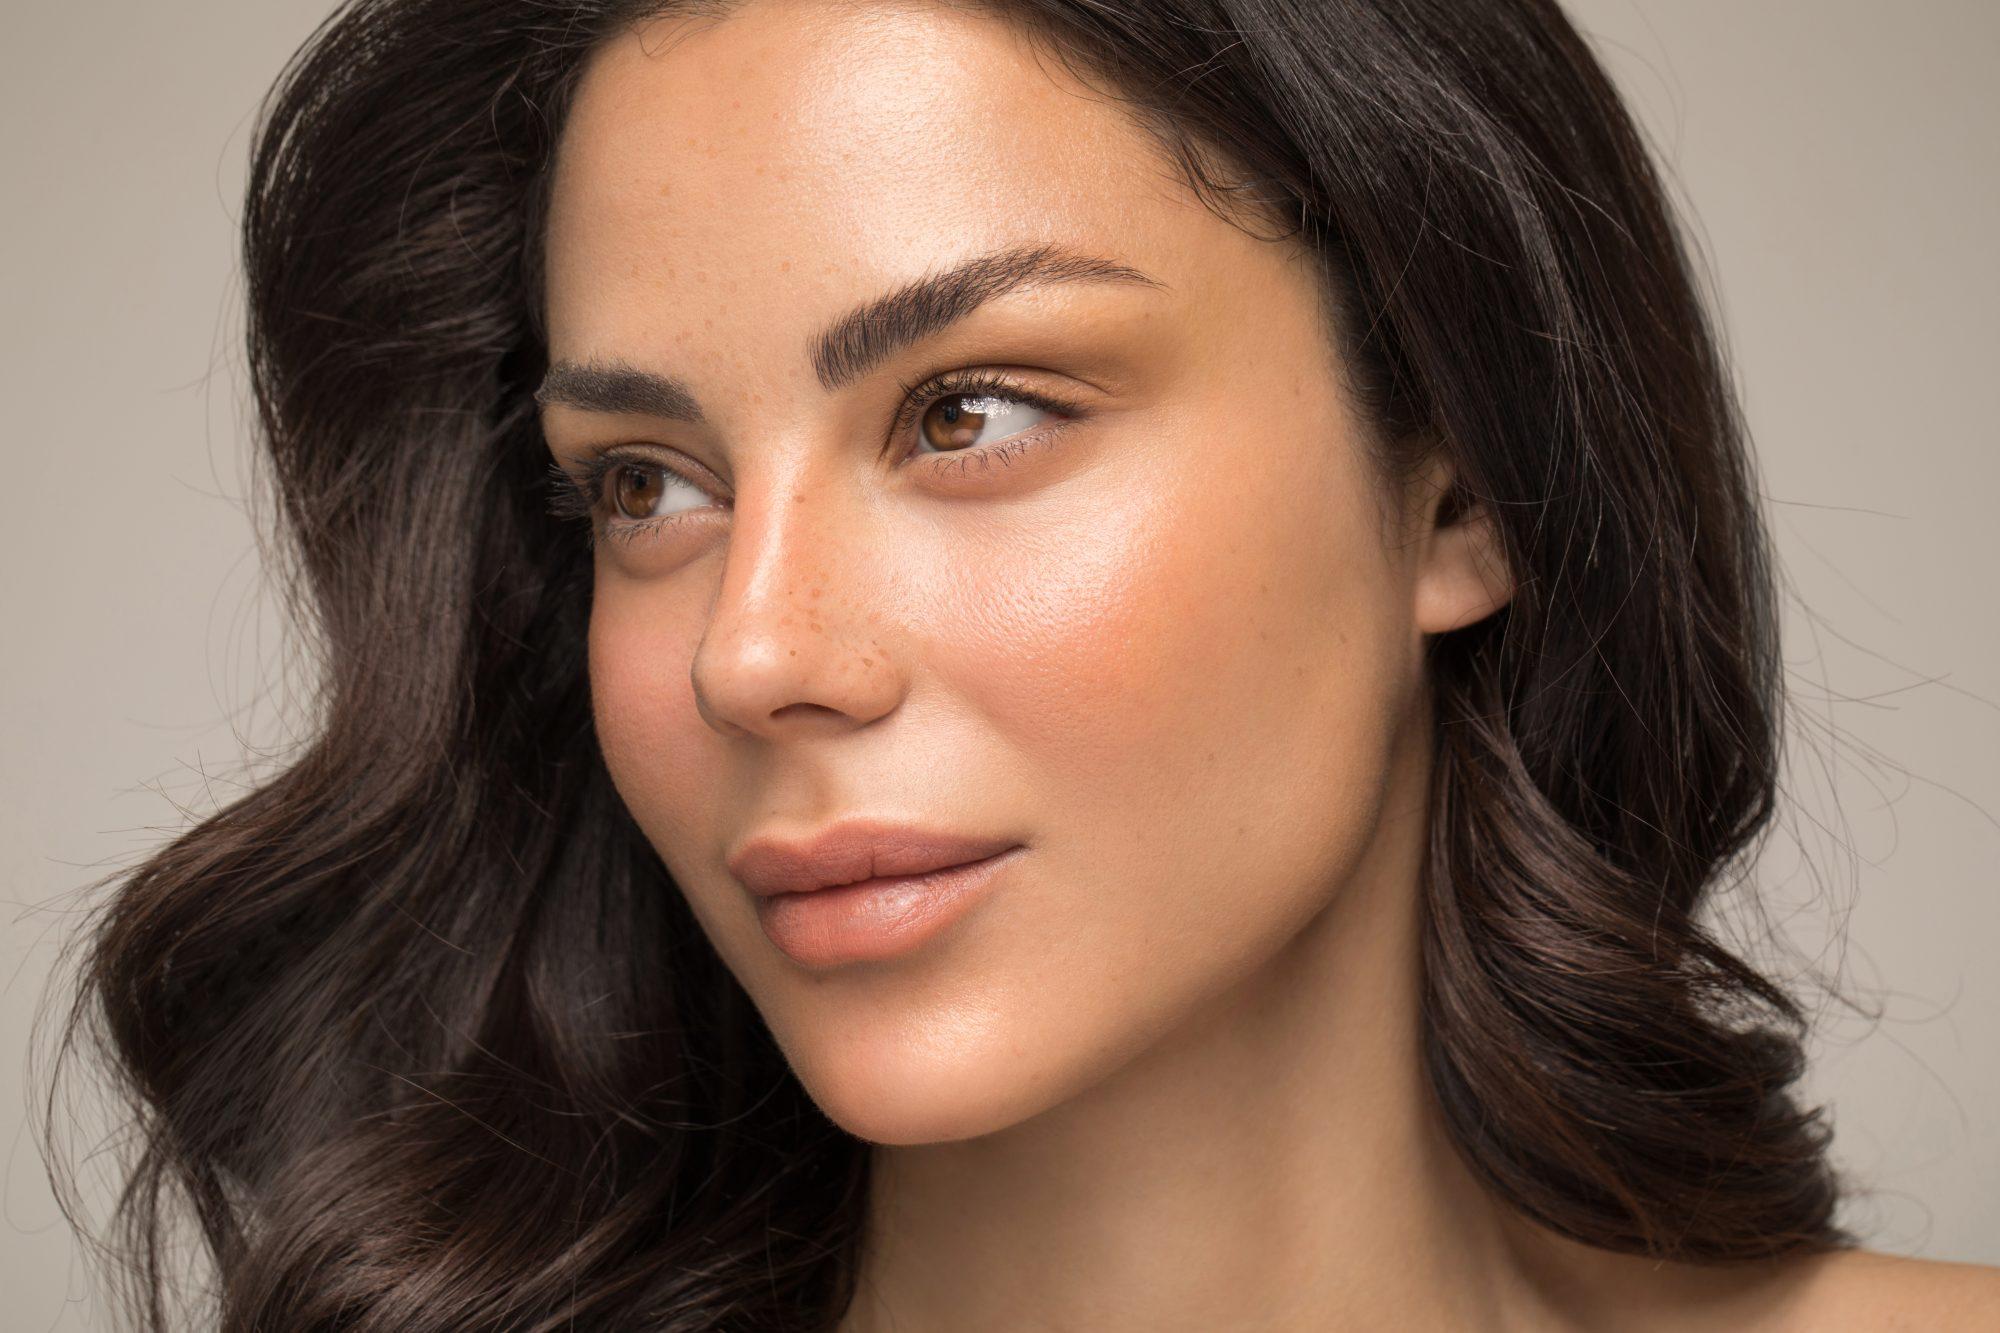 Mujer, piel, rostro, belleza